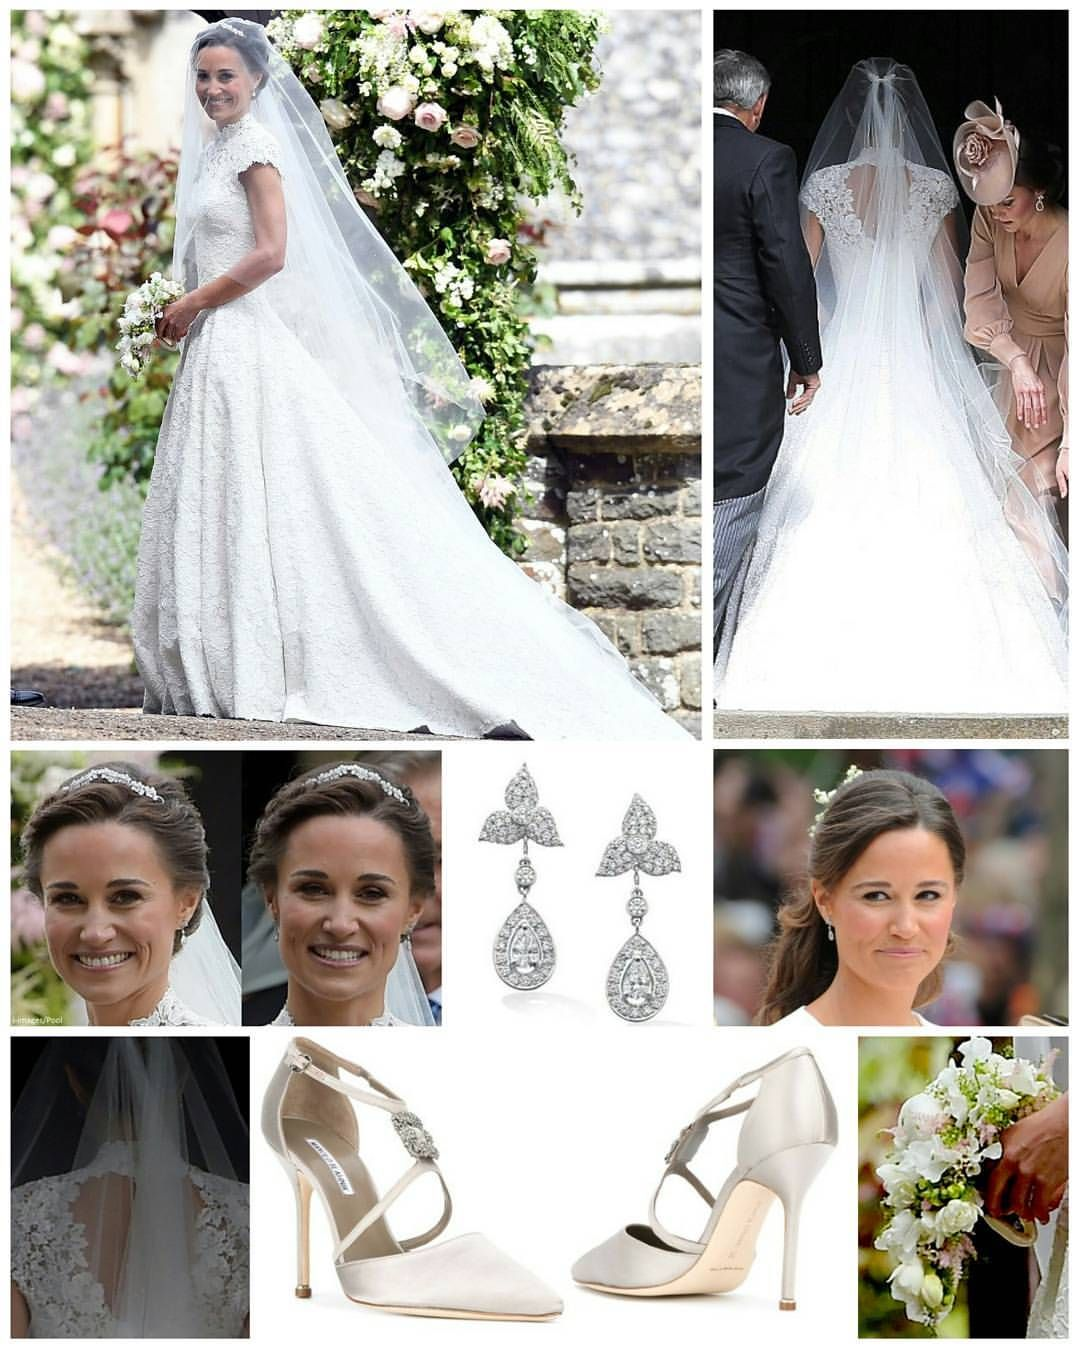 At The Royal Wedding Pippa Middleton S Dress: Pin By Auri N On Duchess Grace & Fashion